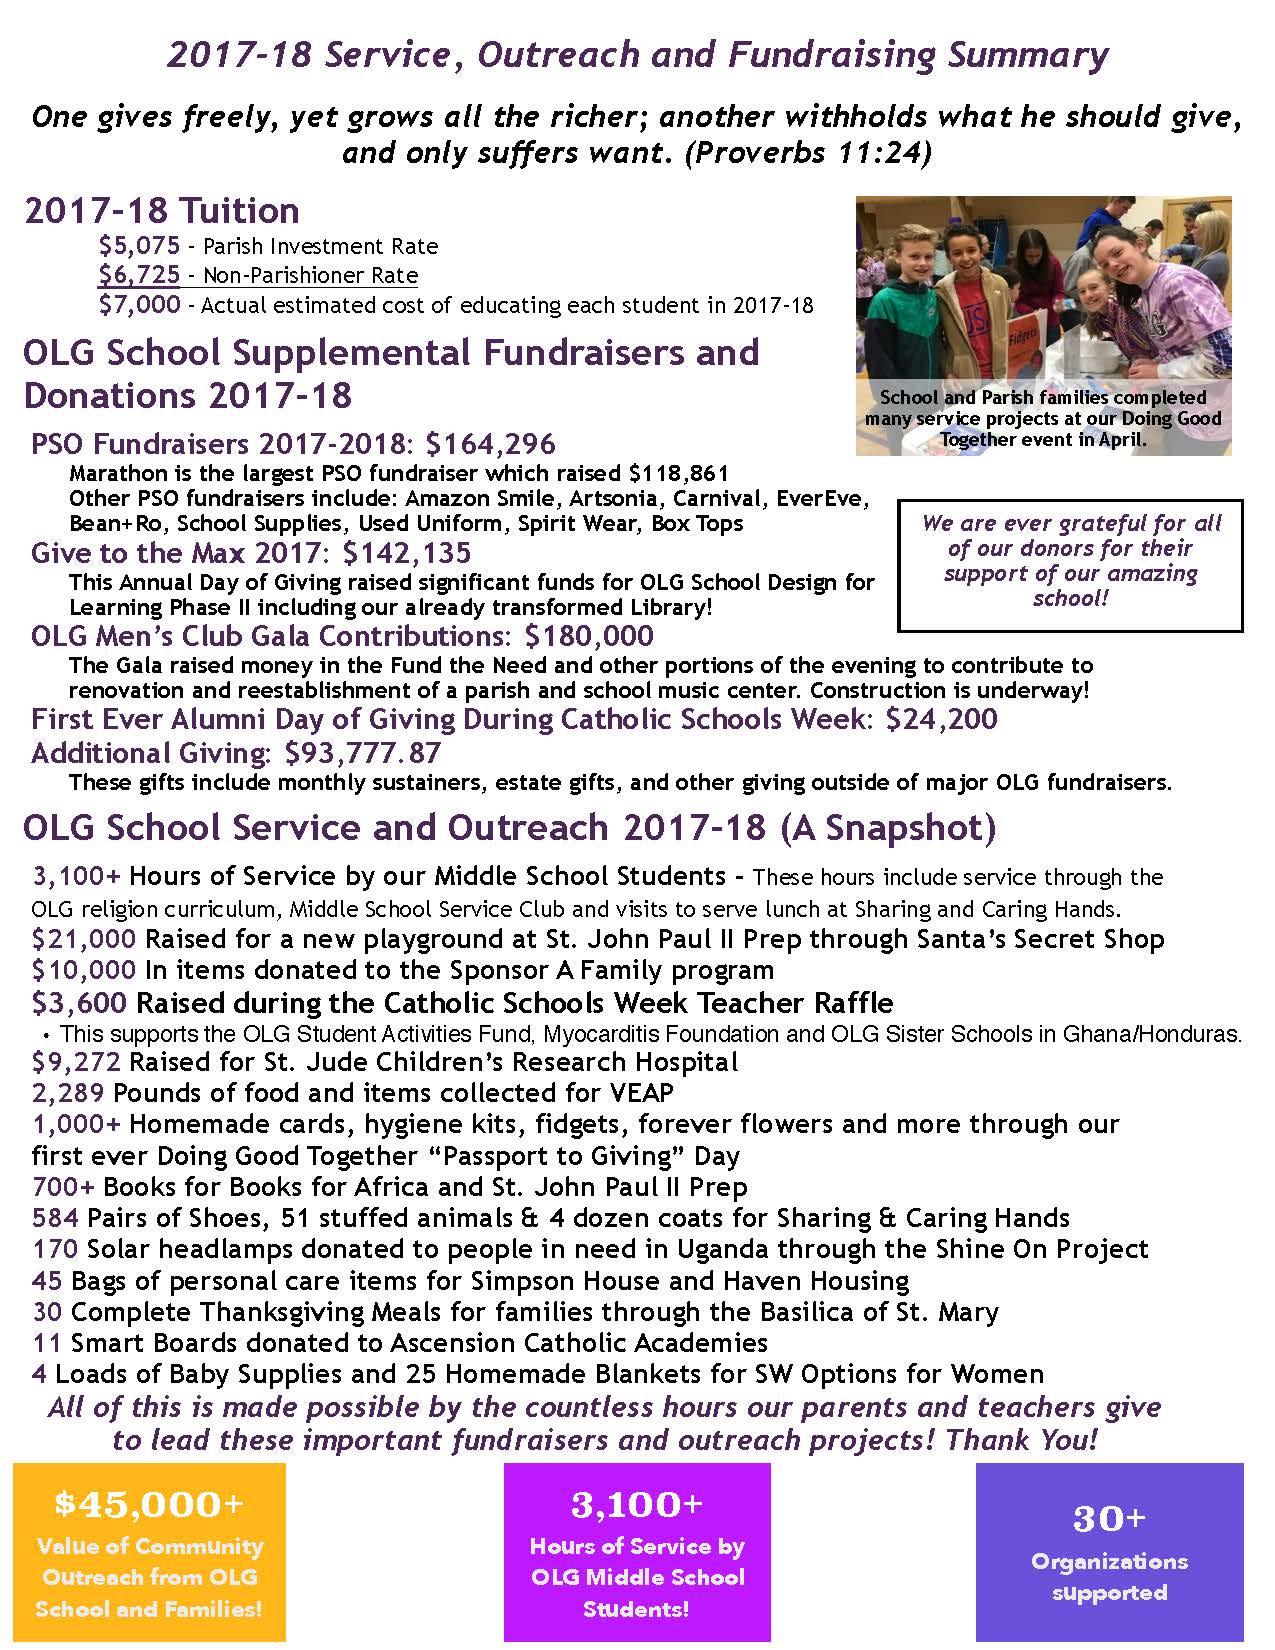 EOY Report 2017-18 Final_Page_2.jpg